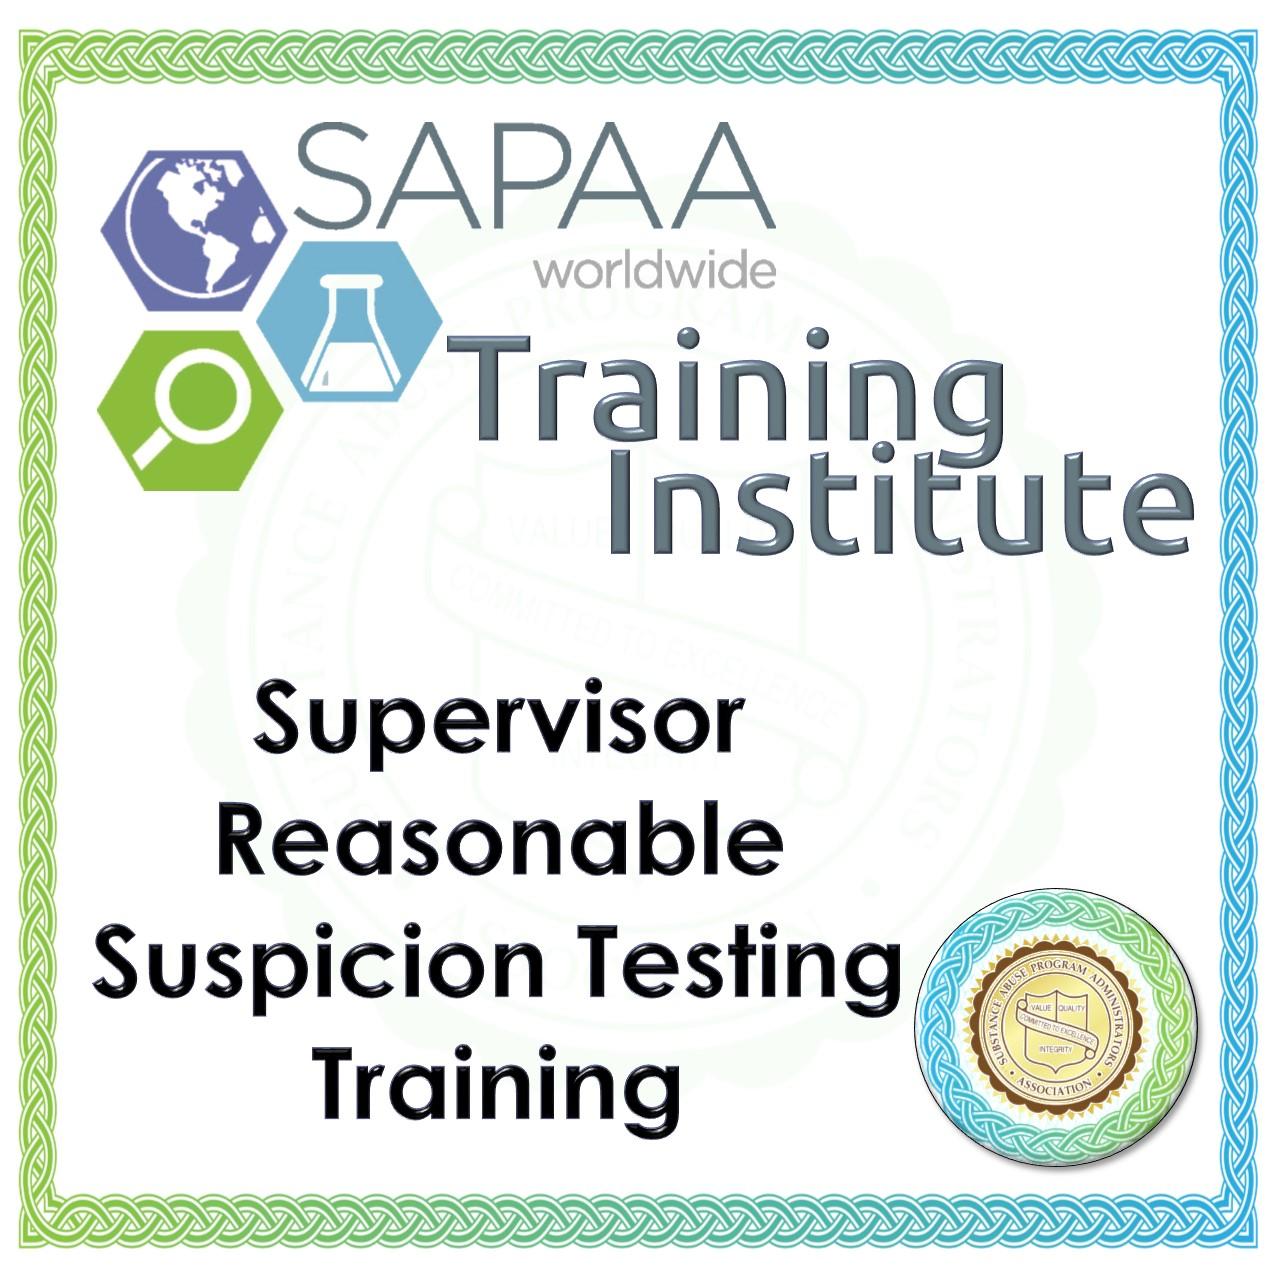 supervisor reasonable suspicion testing training substance abuse